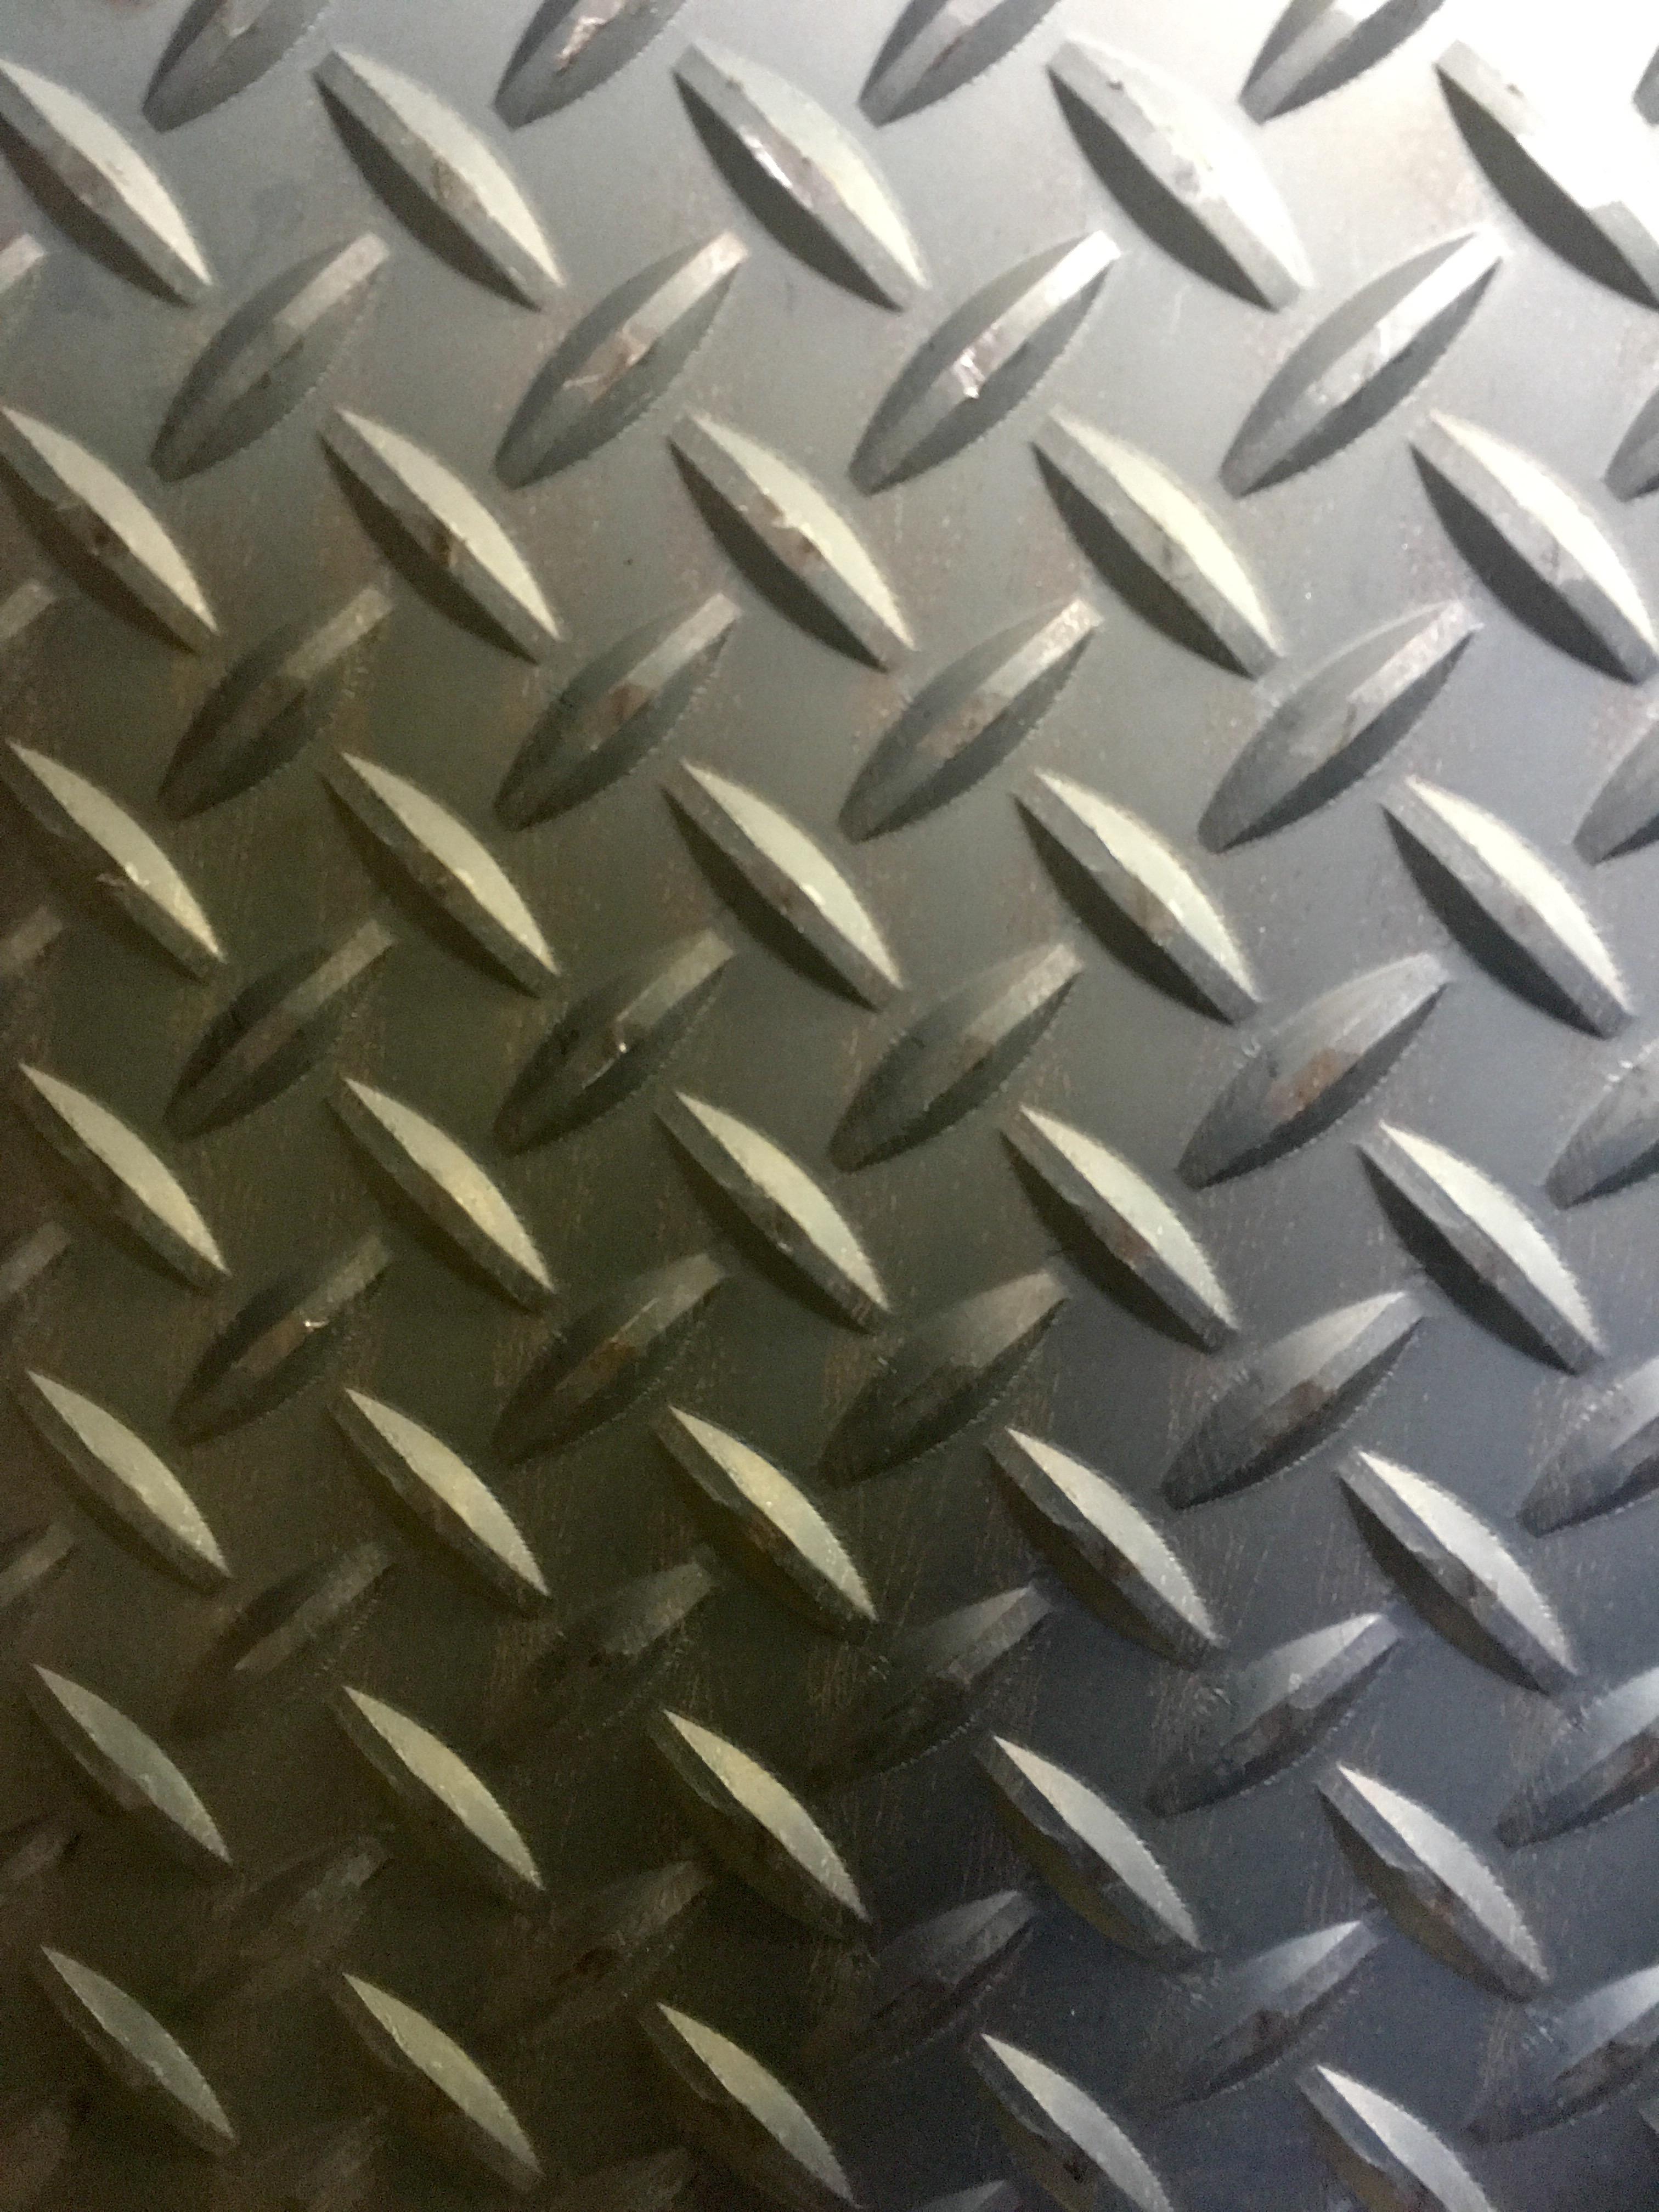 Human Fall Flat Wallpaper Free Photo Metal Plate Screw Screws Scratched Free